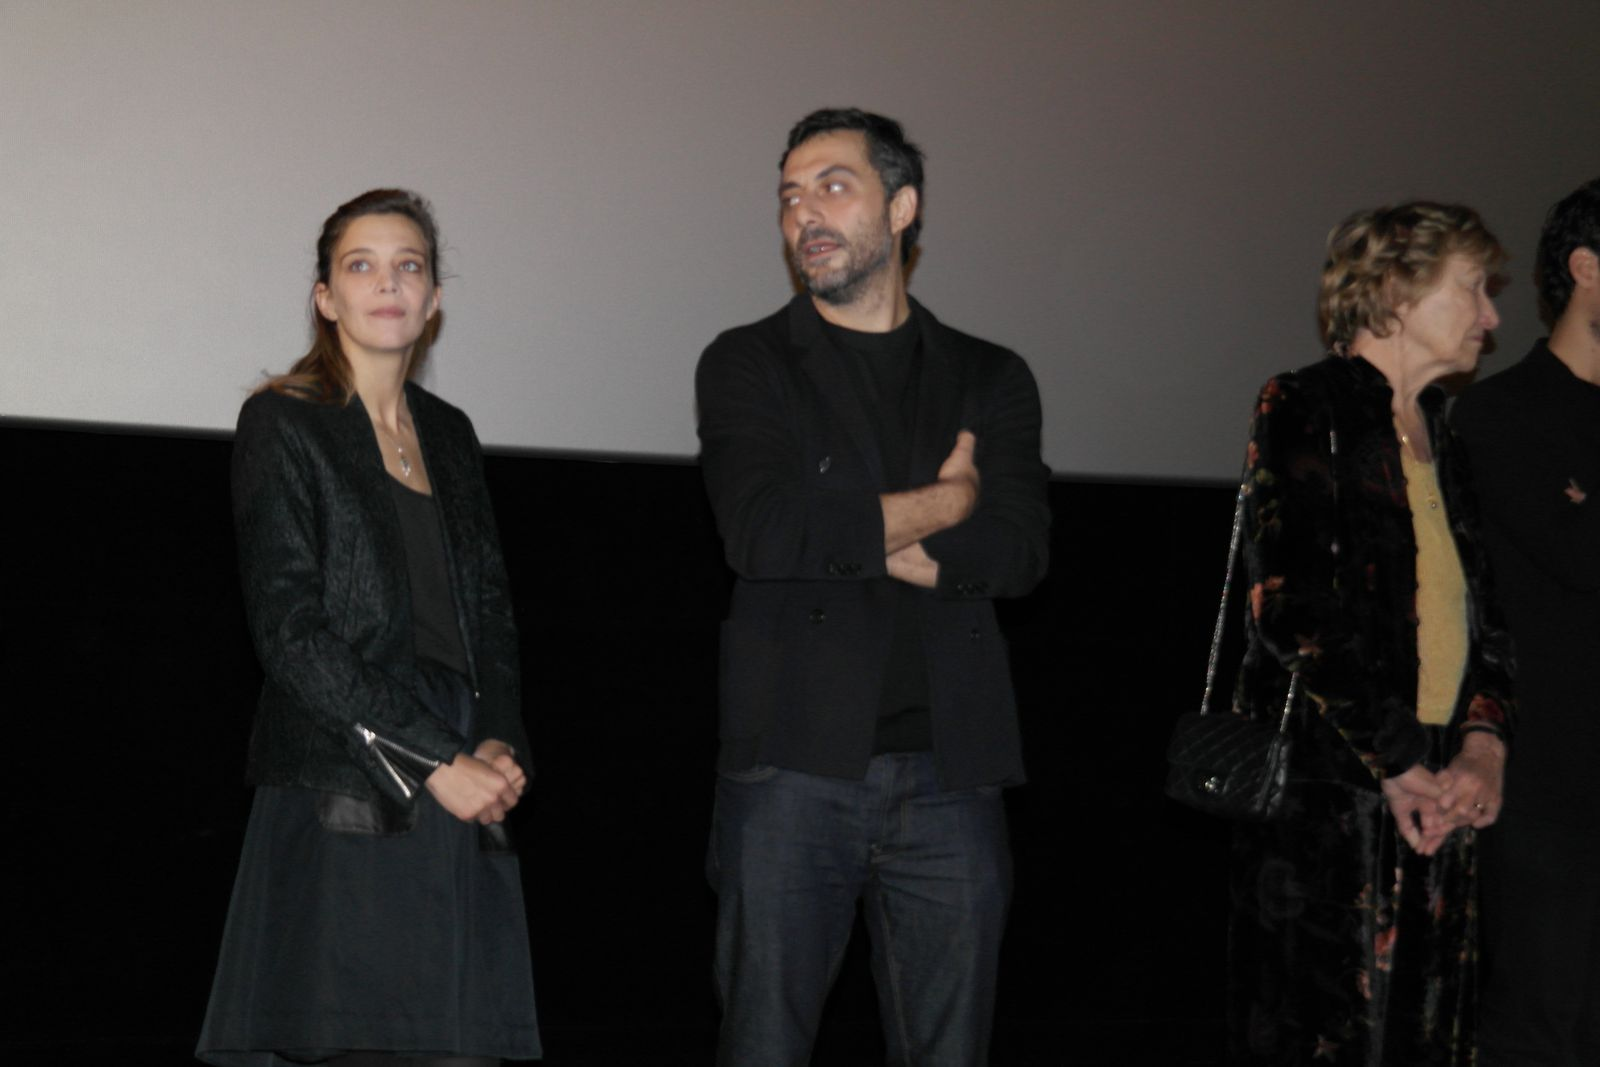 Céline Sallette, Filippi Timi